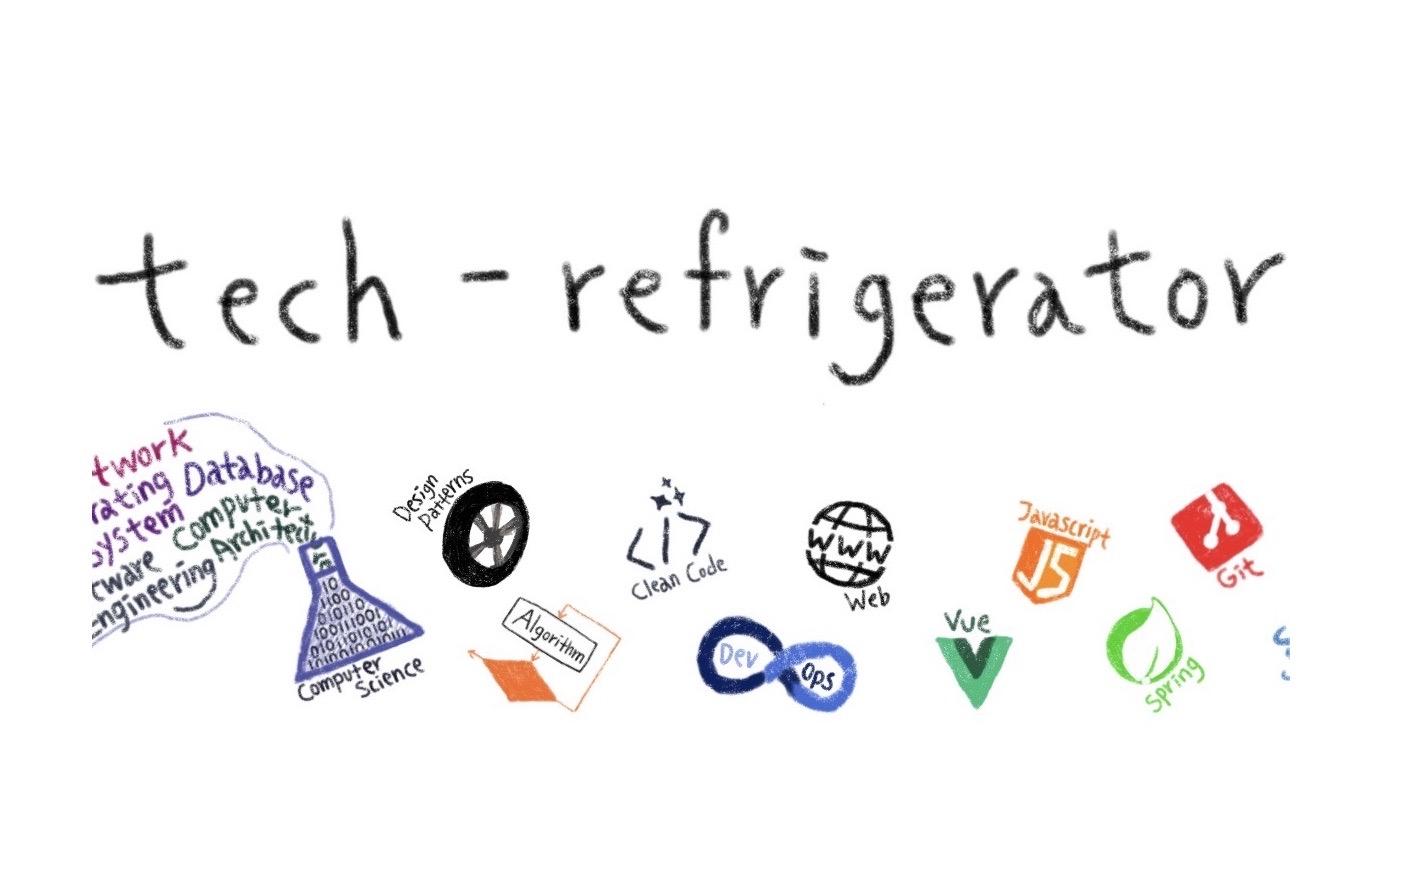 tech-refrigerator